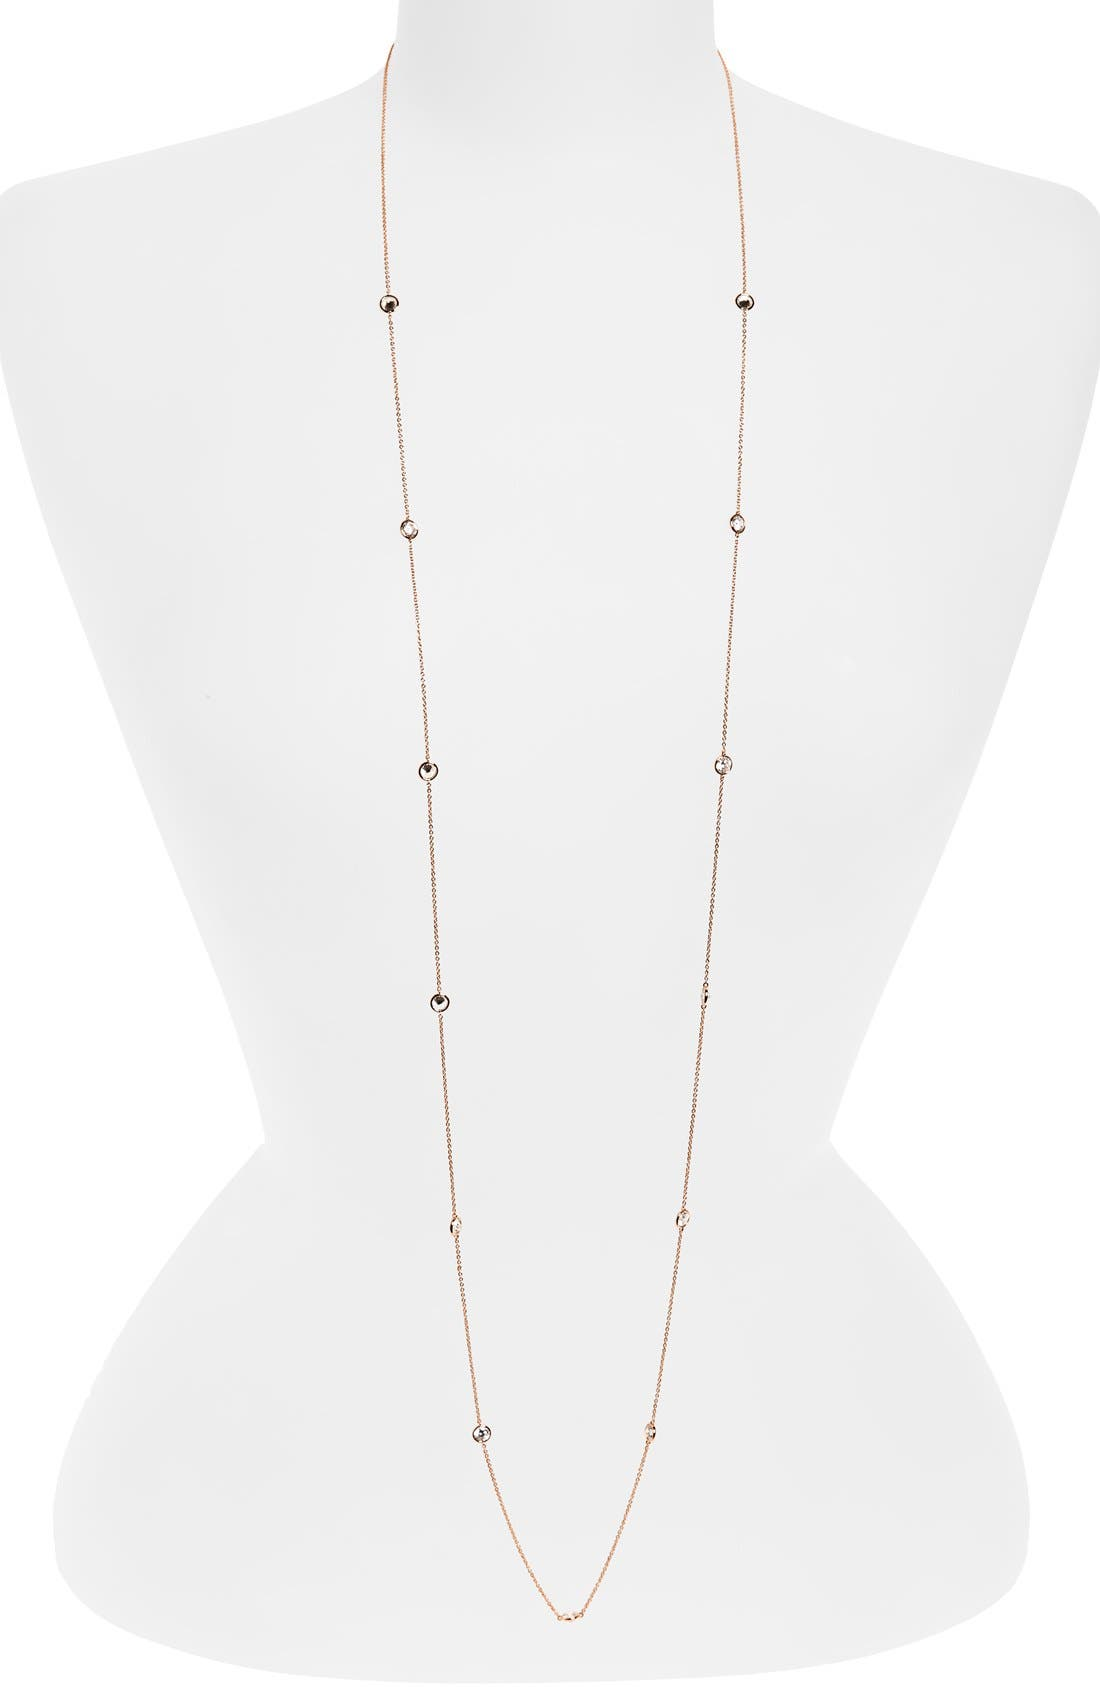 Alternate Image 1 Selected - Nadri Long Bezel Station Necklace